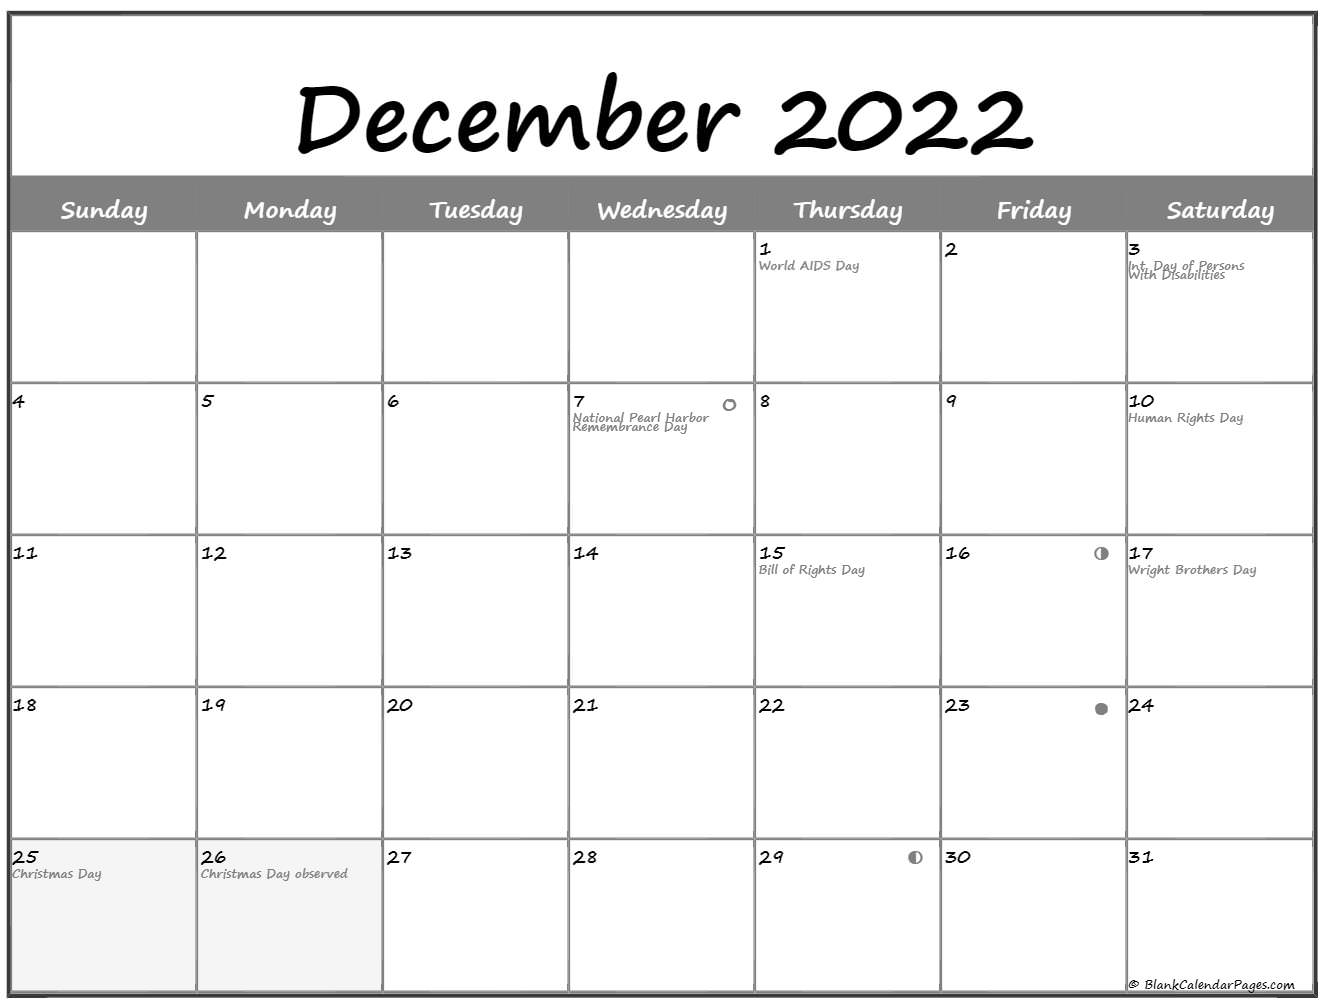 December 2022 Lunar Calendar   Moon Phase Calendar